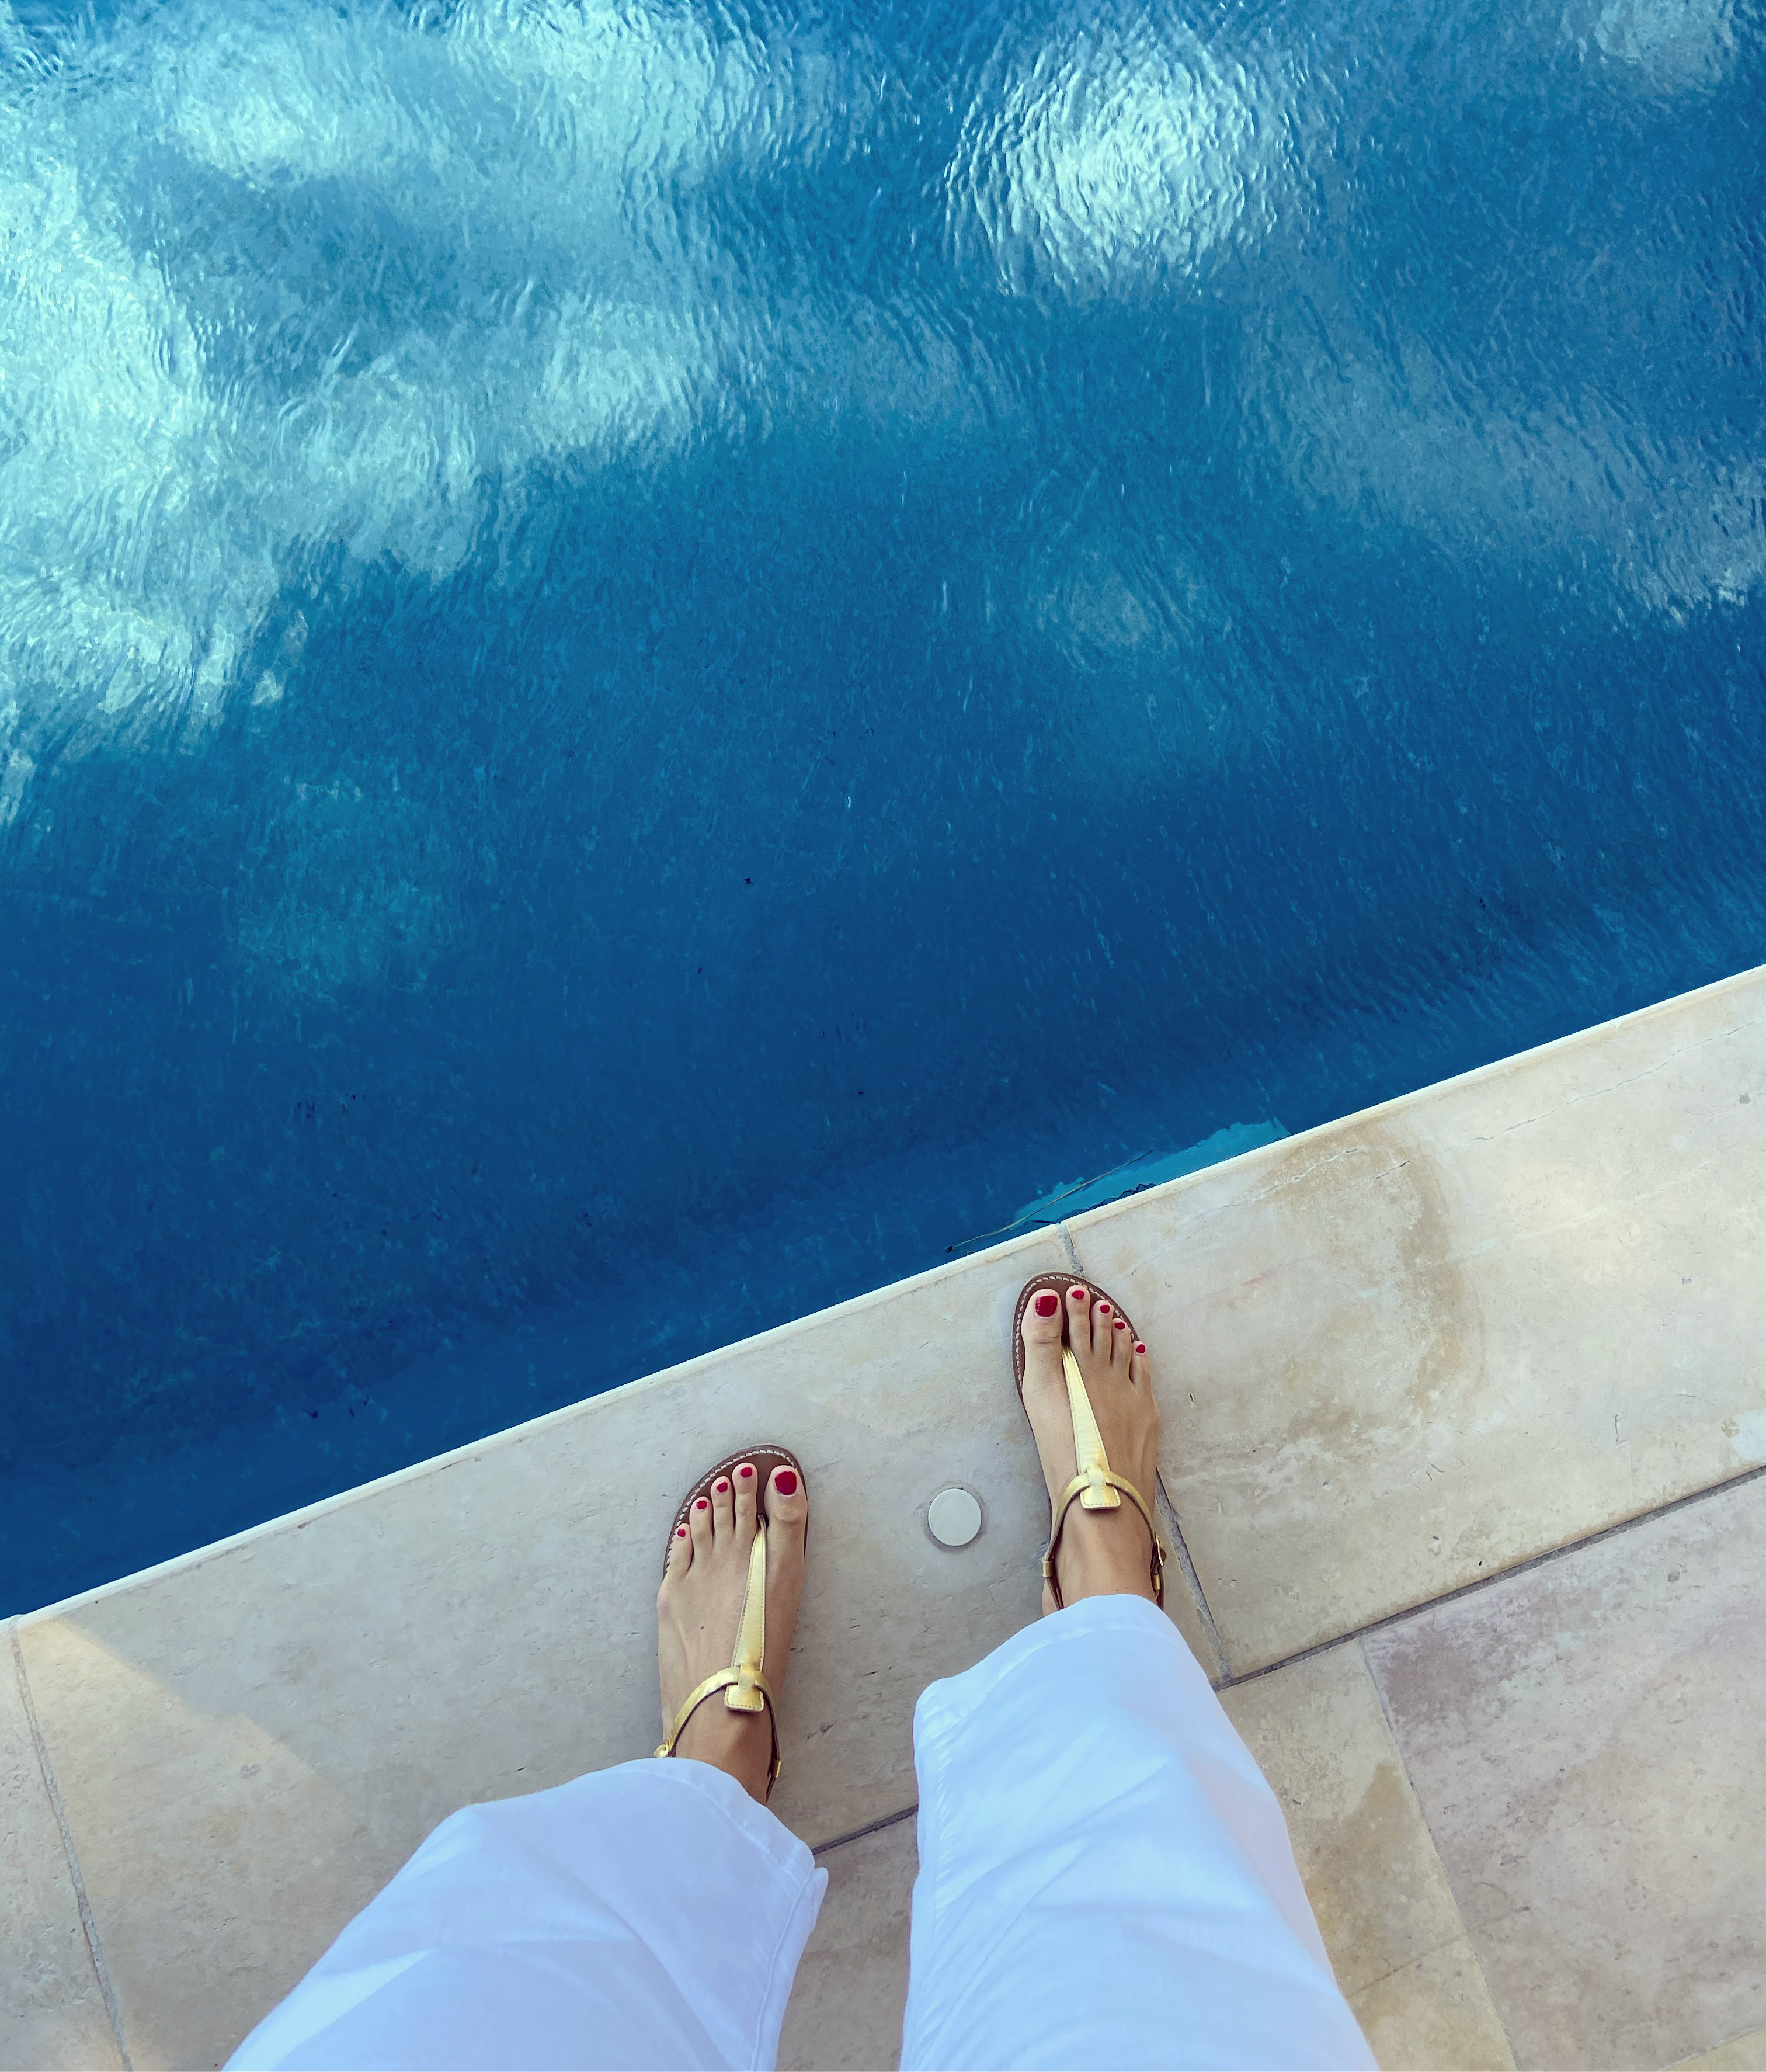 Salomé rondini bord de piscine